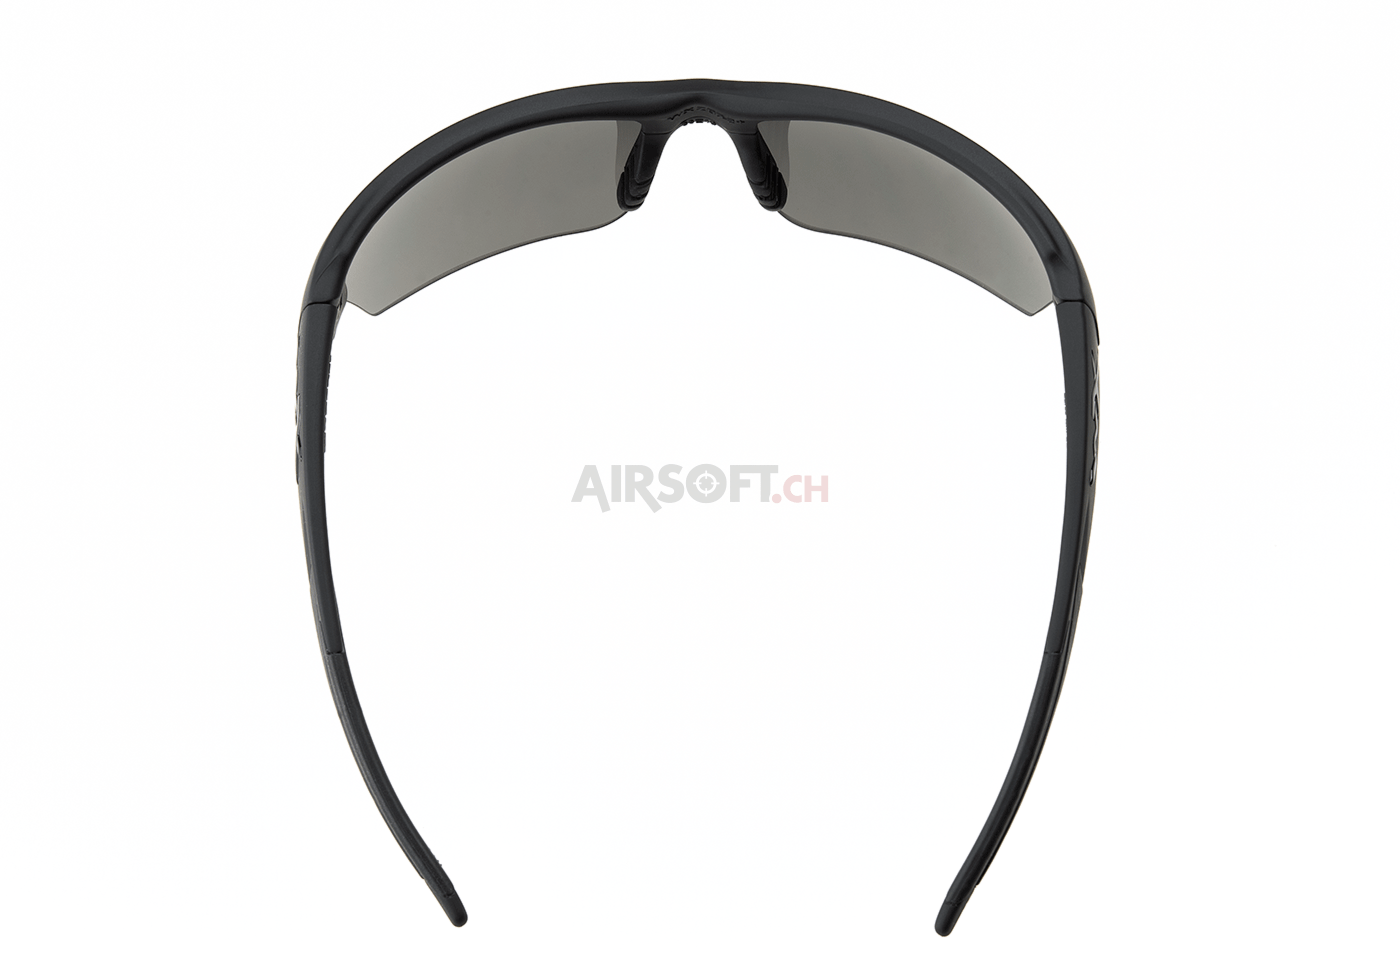 7c5b076087 WX Saint Grey   Clear Black (Wiley X) - Eyewear - Protective Equipment -  airsoft.ch Online shop